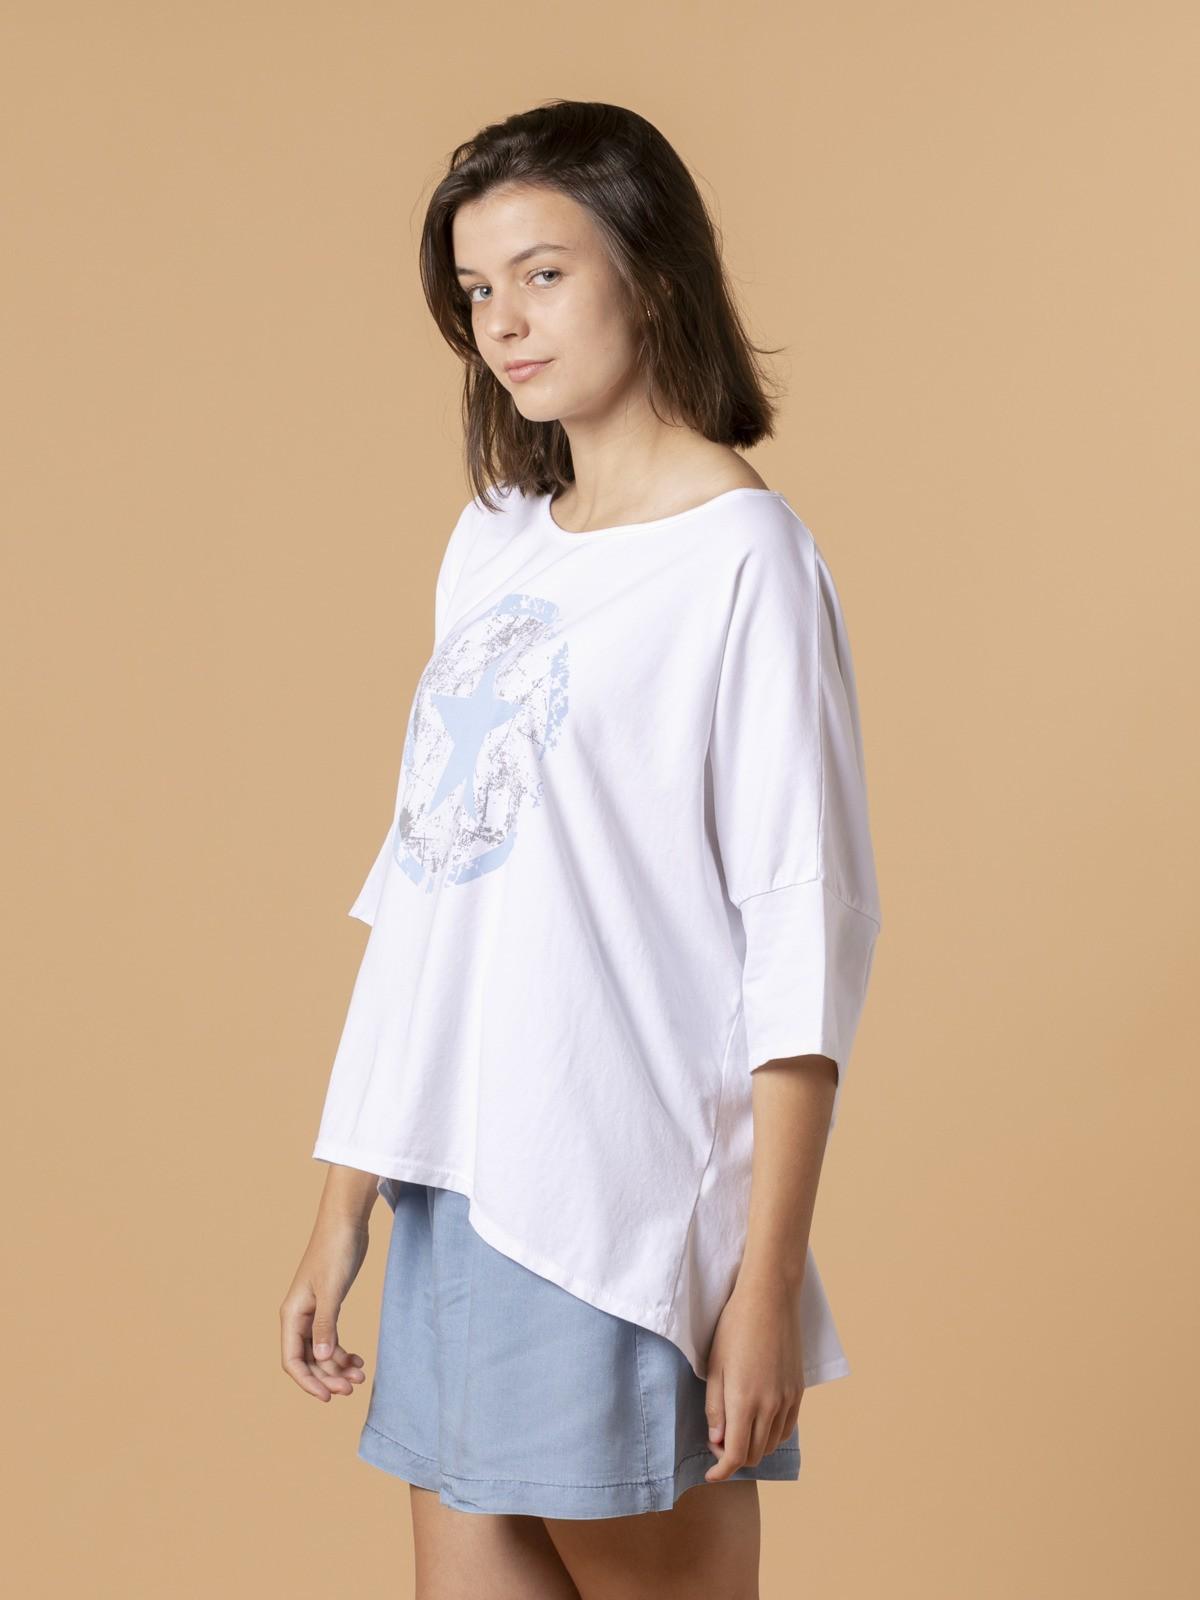 Camiseta mujer estrella Azul